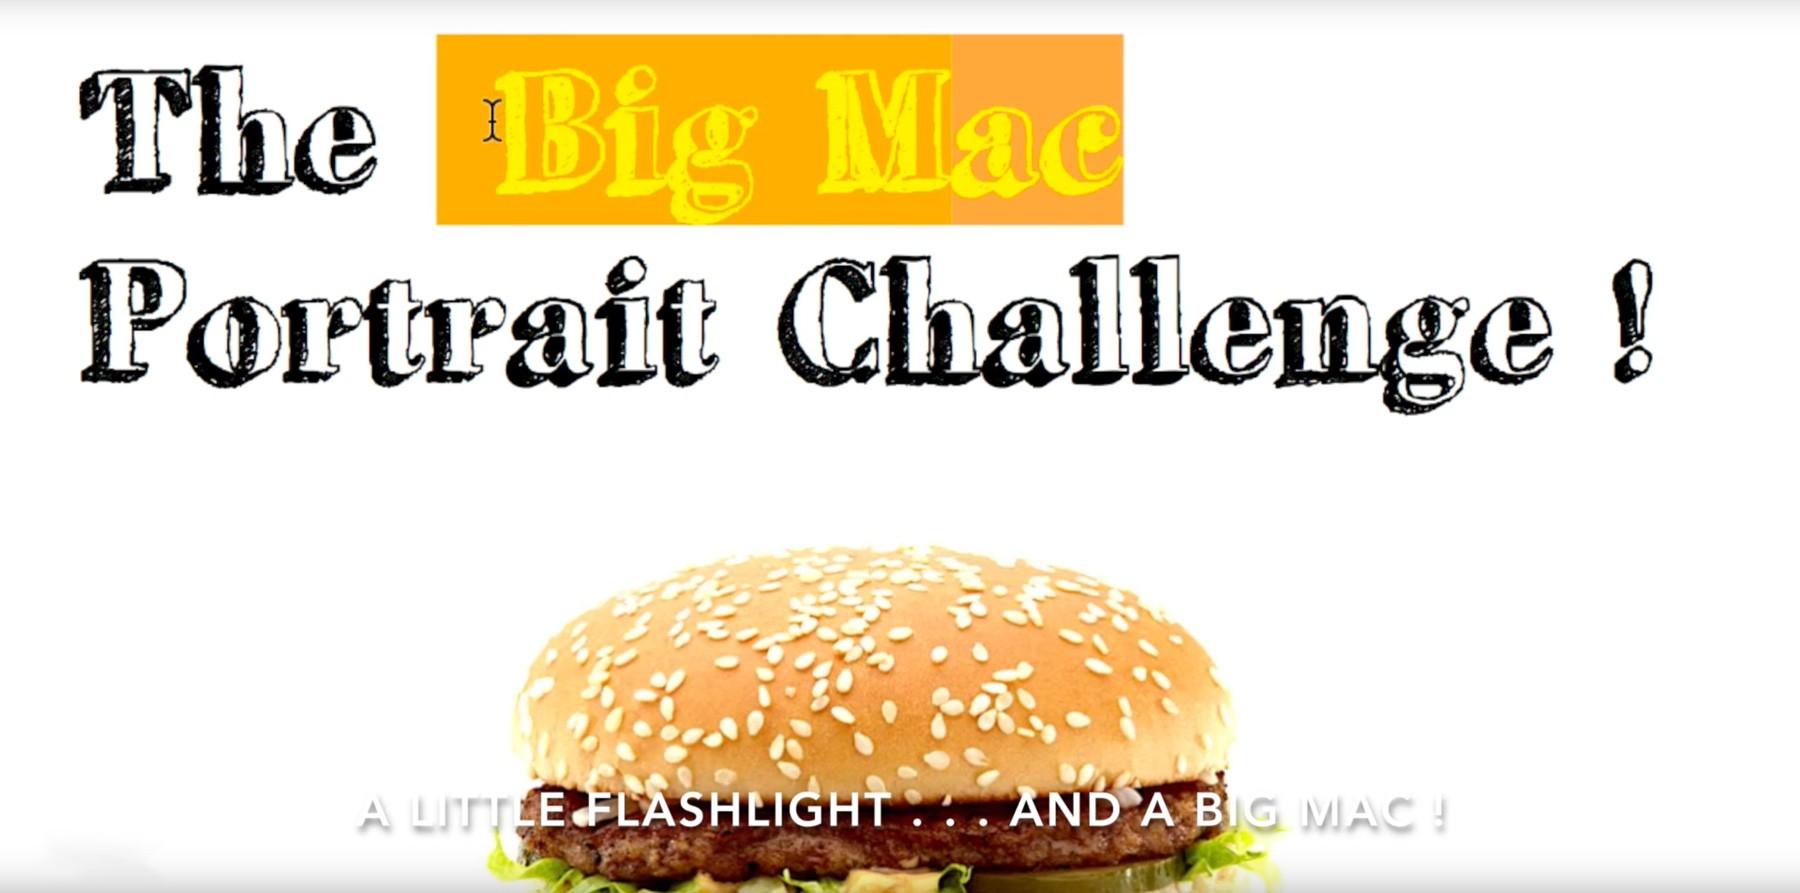 The Big Mac Portrait Challenge!